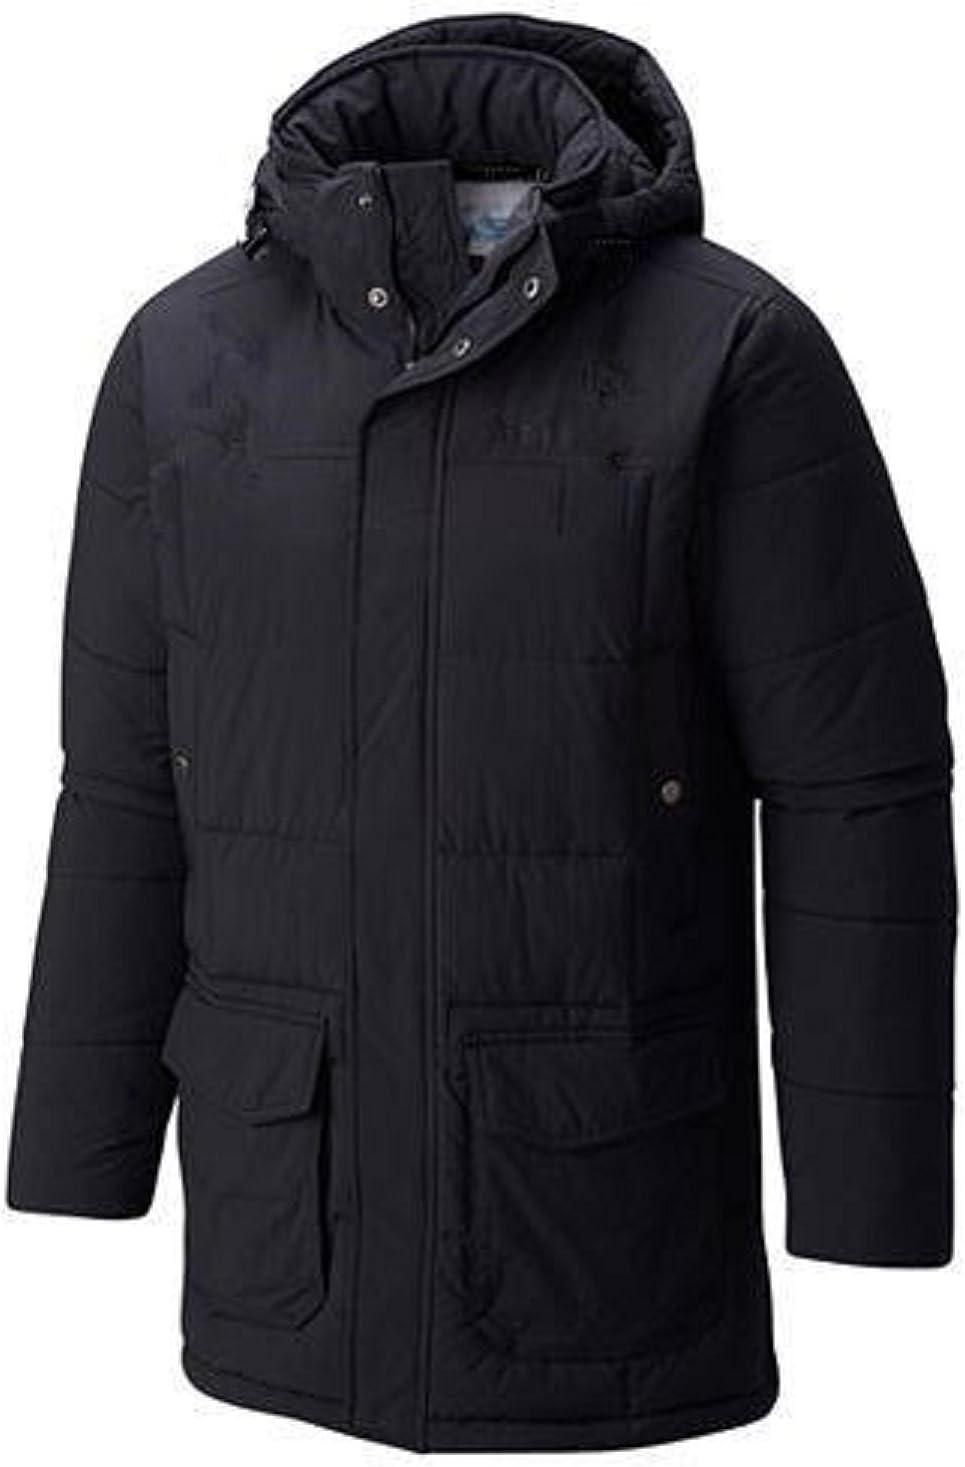 Men's Winter Coat Jacket Long Parka Ultra Warm Snow Ski Removable Hood Fleece Lining All USA Sizes